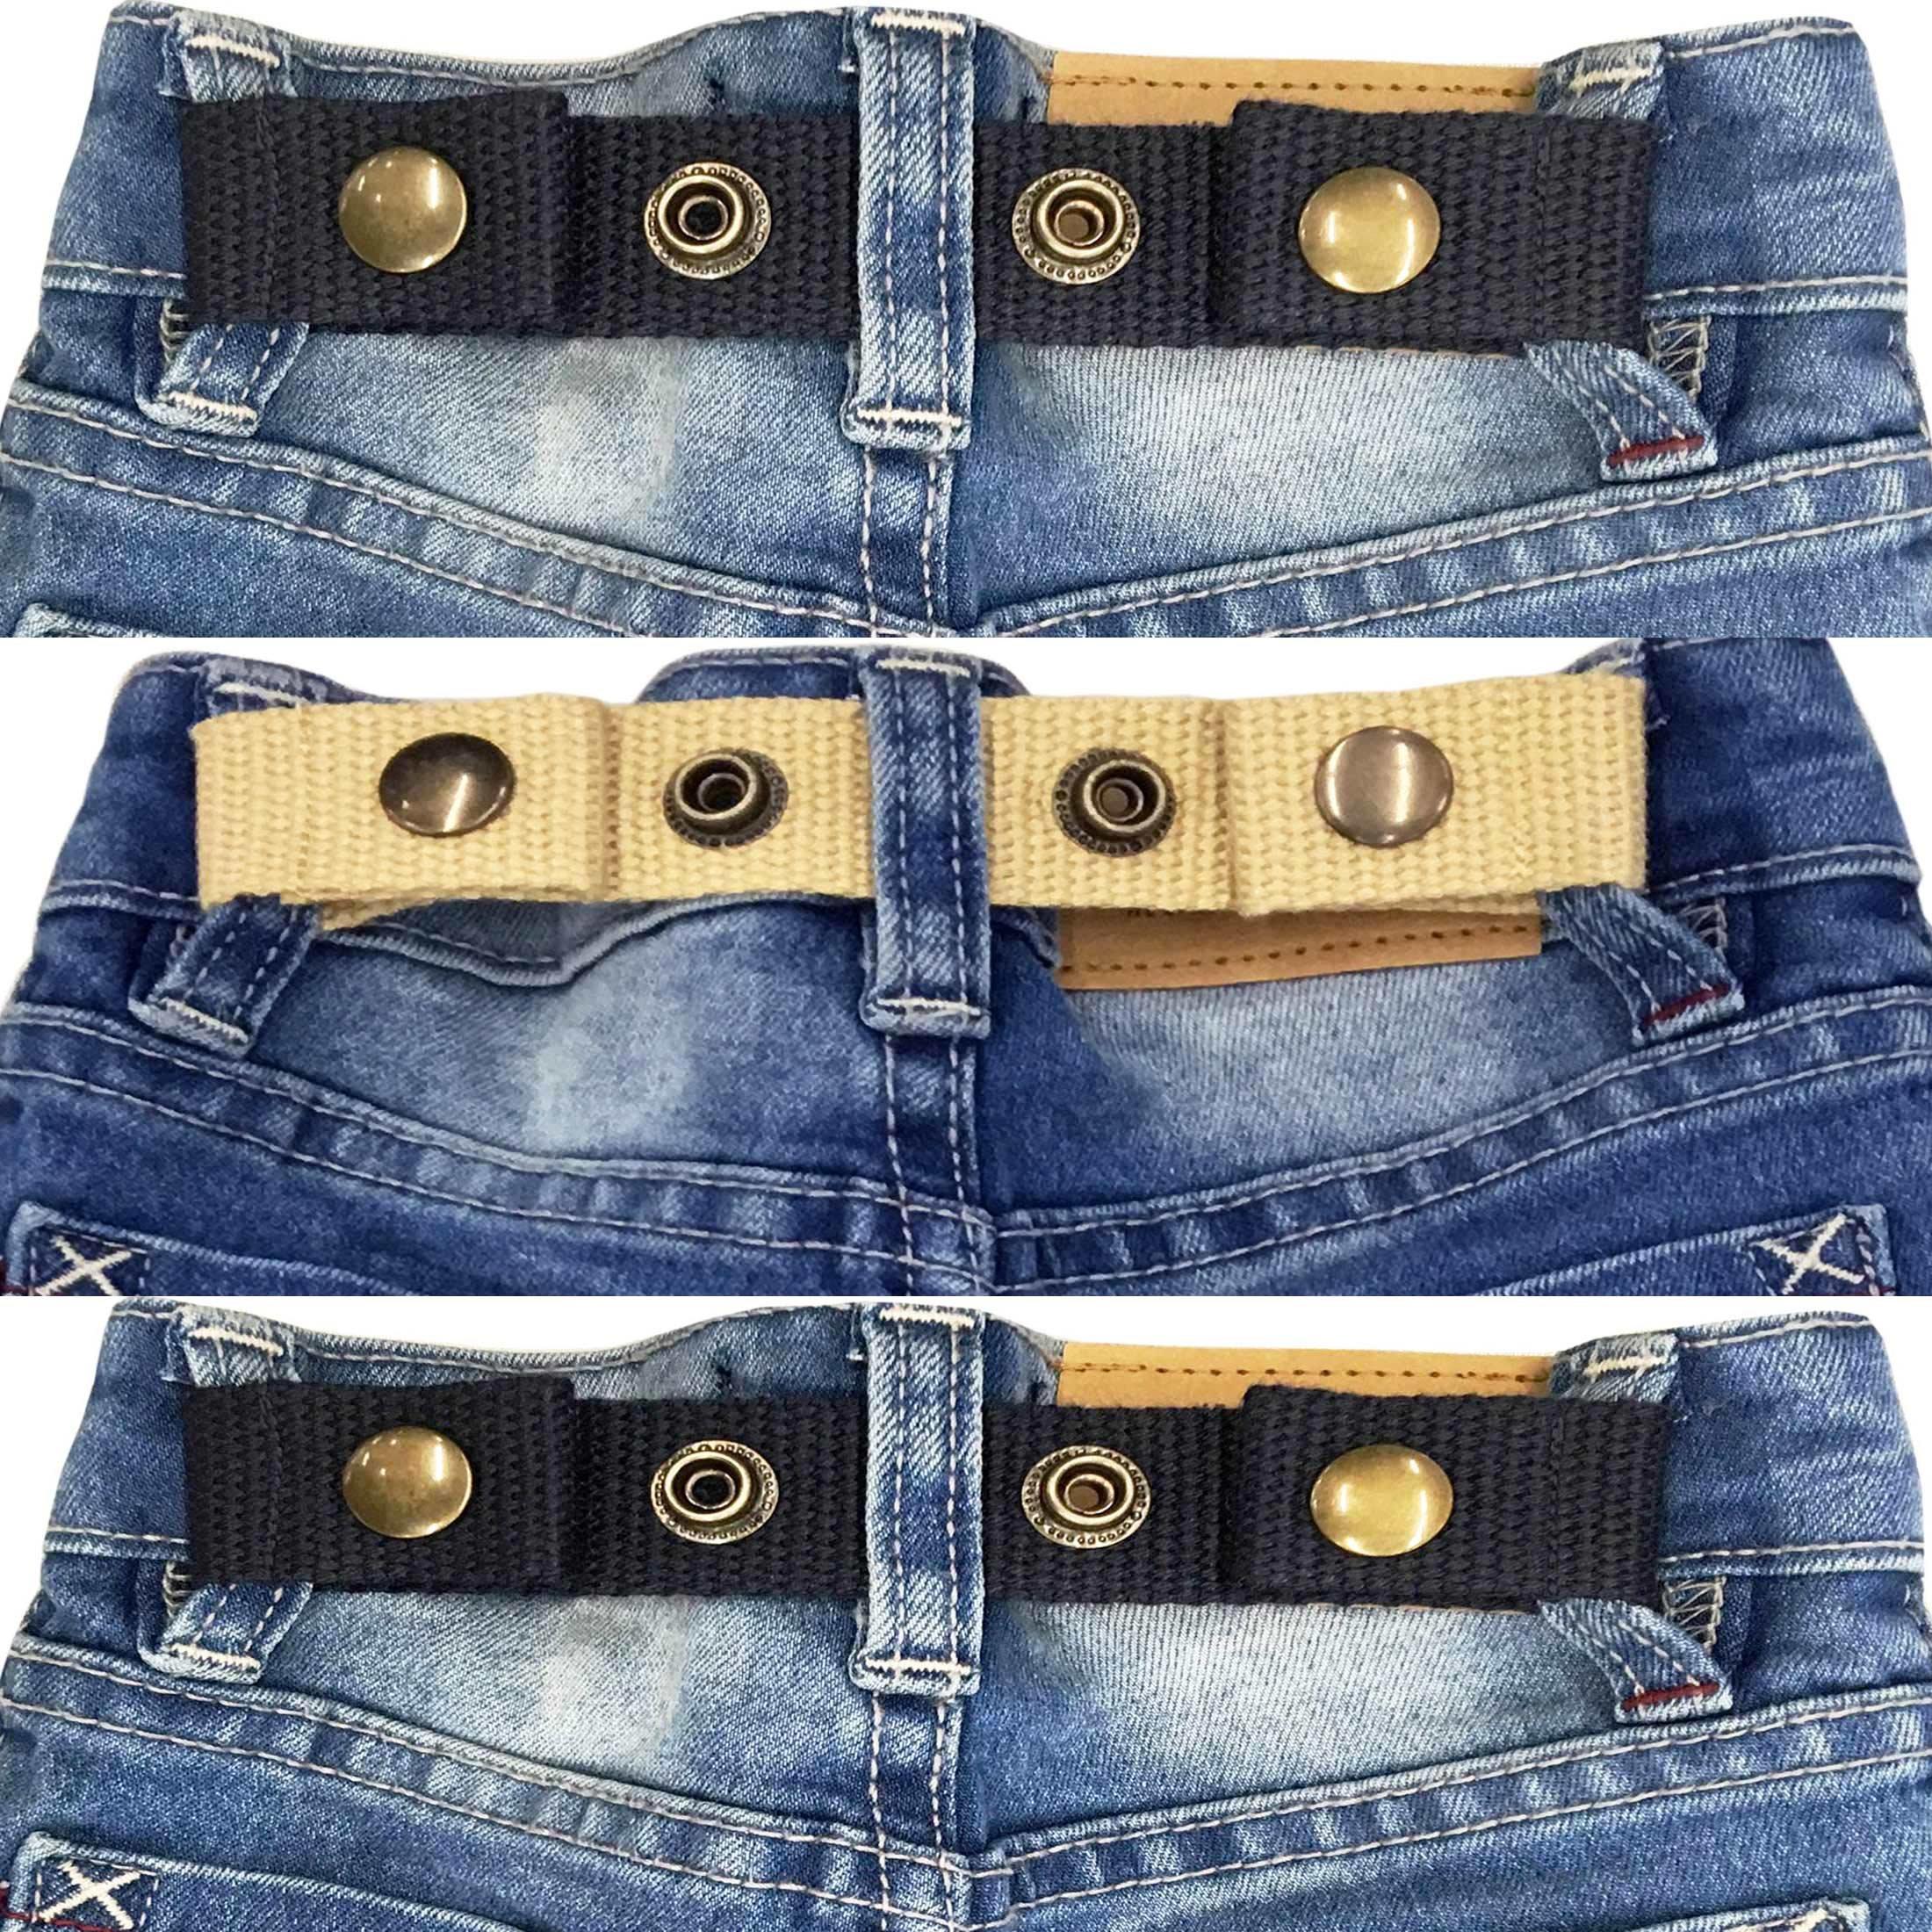 Sister Selected Adjustable Snap Belt for Baby/Toddler Boy & Girl Pant - 3 Pack: (No. 4)